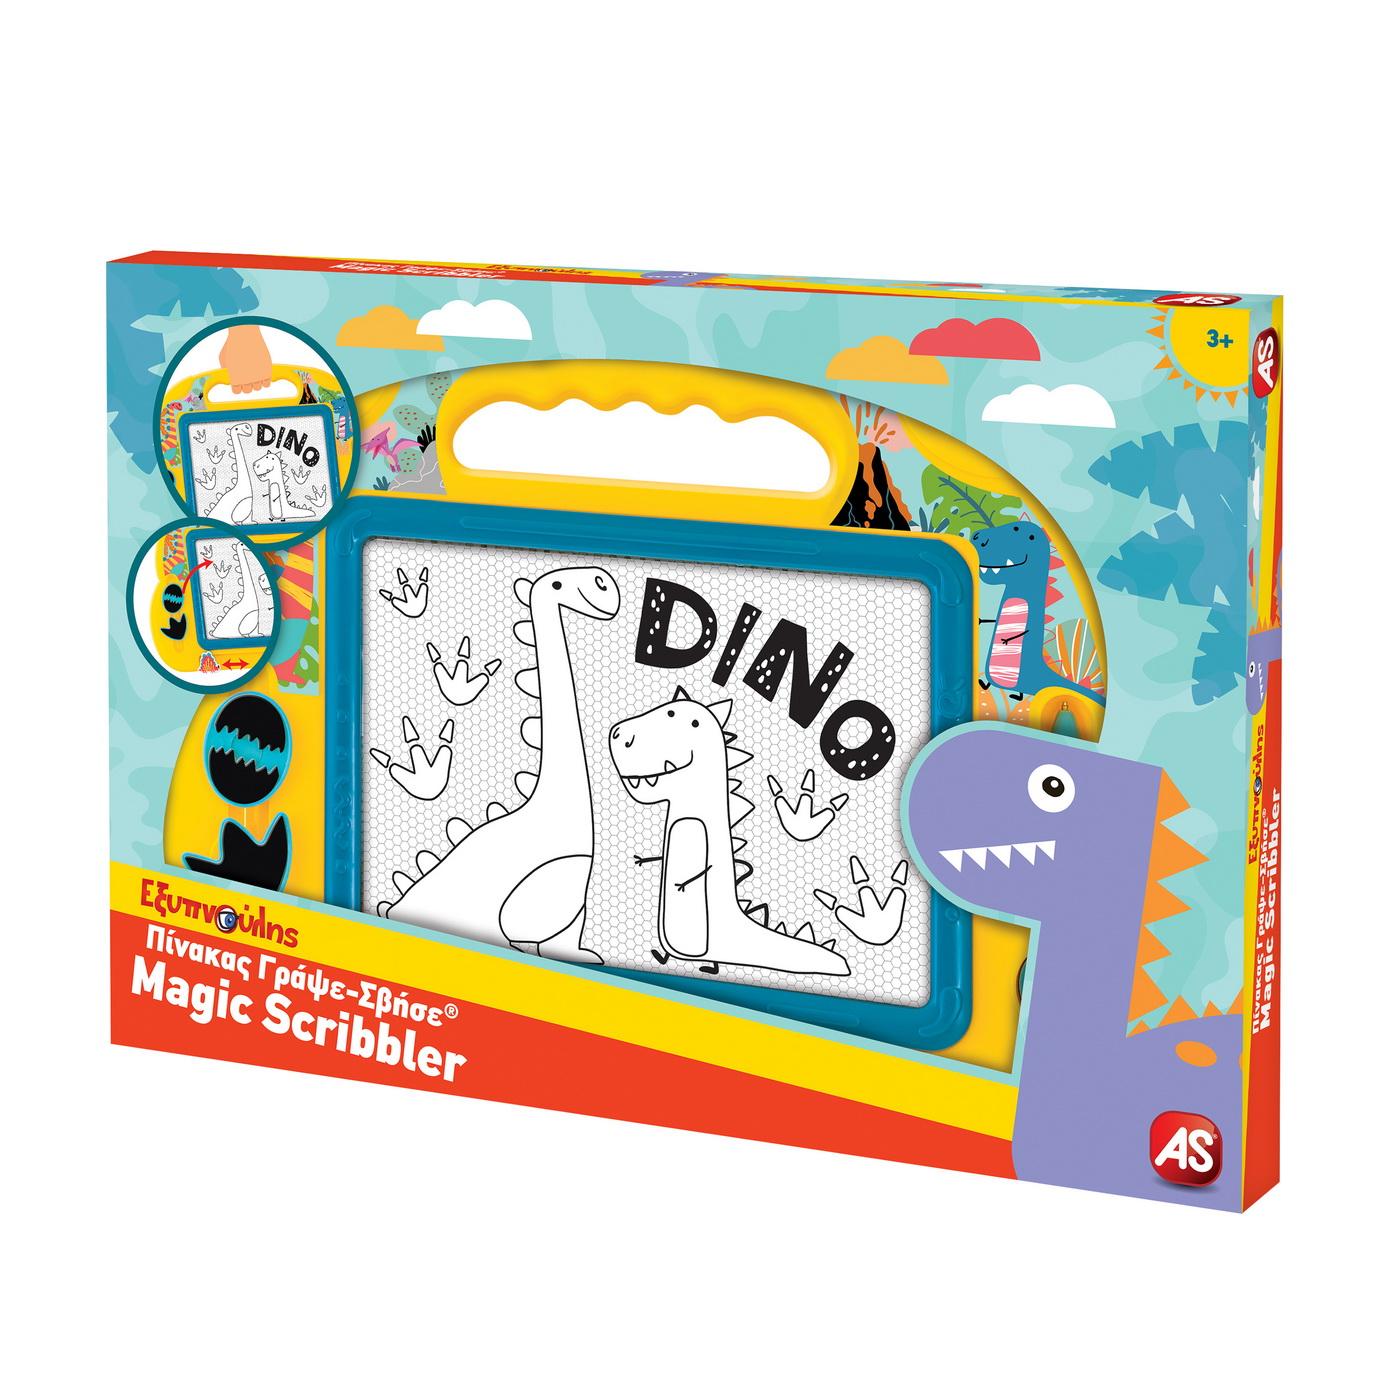 Tabla magnetica - Magic Scribbler: Dino